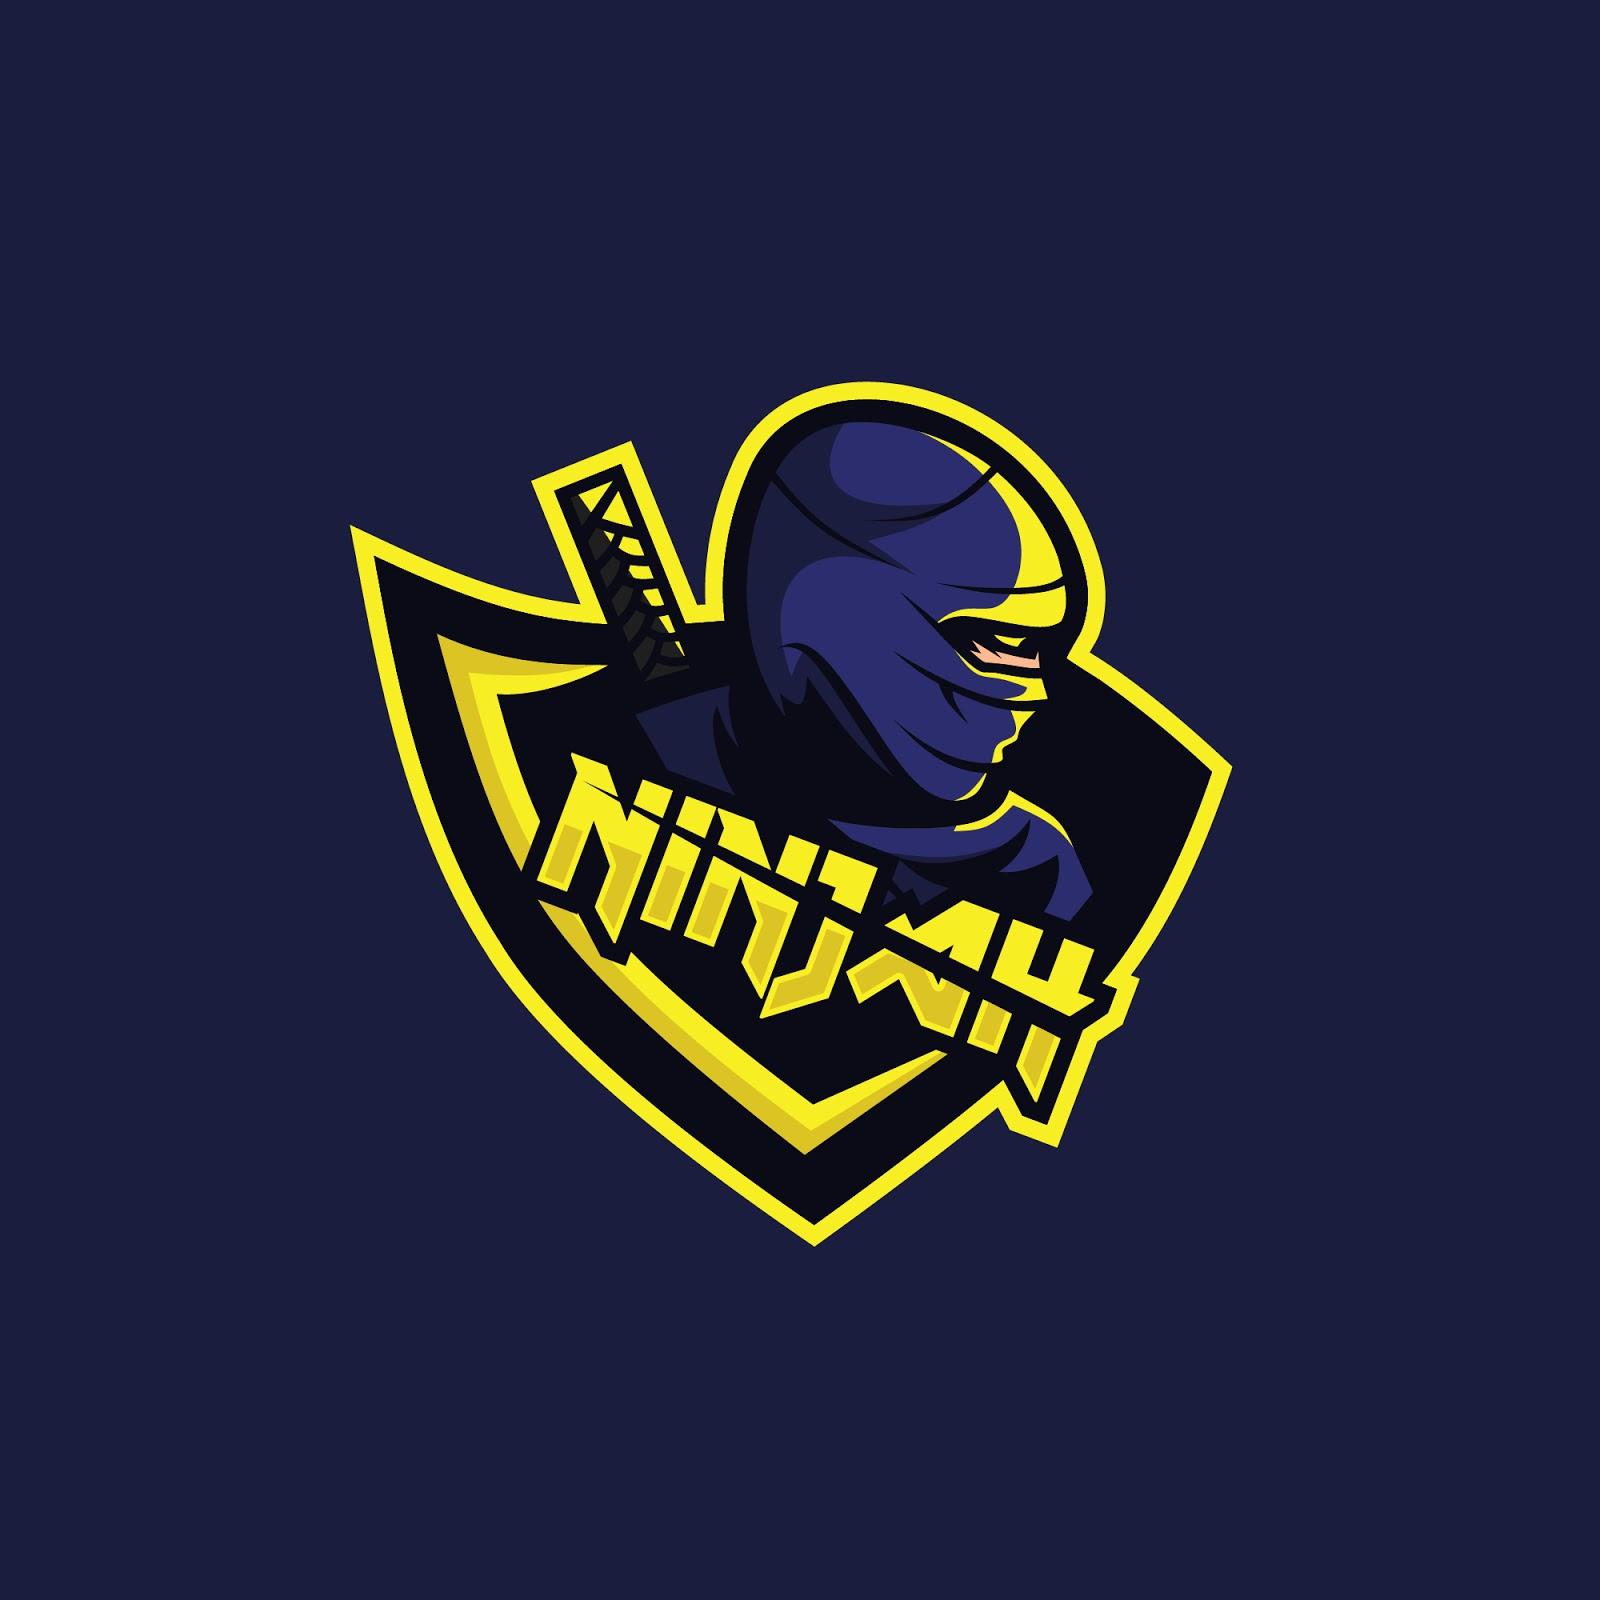 Ninja Logo Squad Gaming Free Download Vector CDR, AI, EPS and PNG Formats